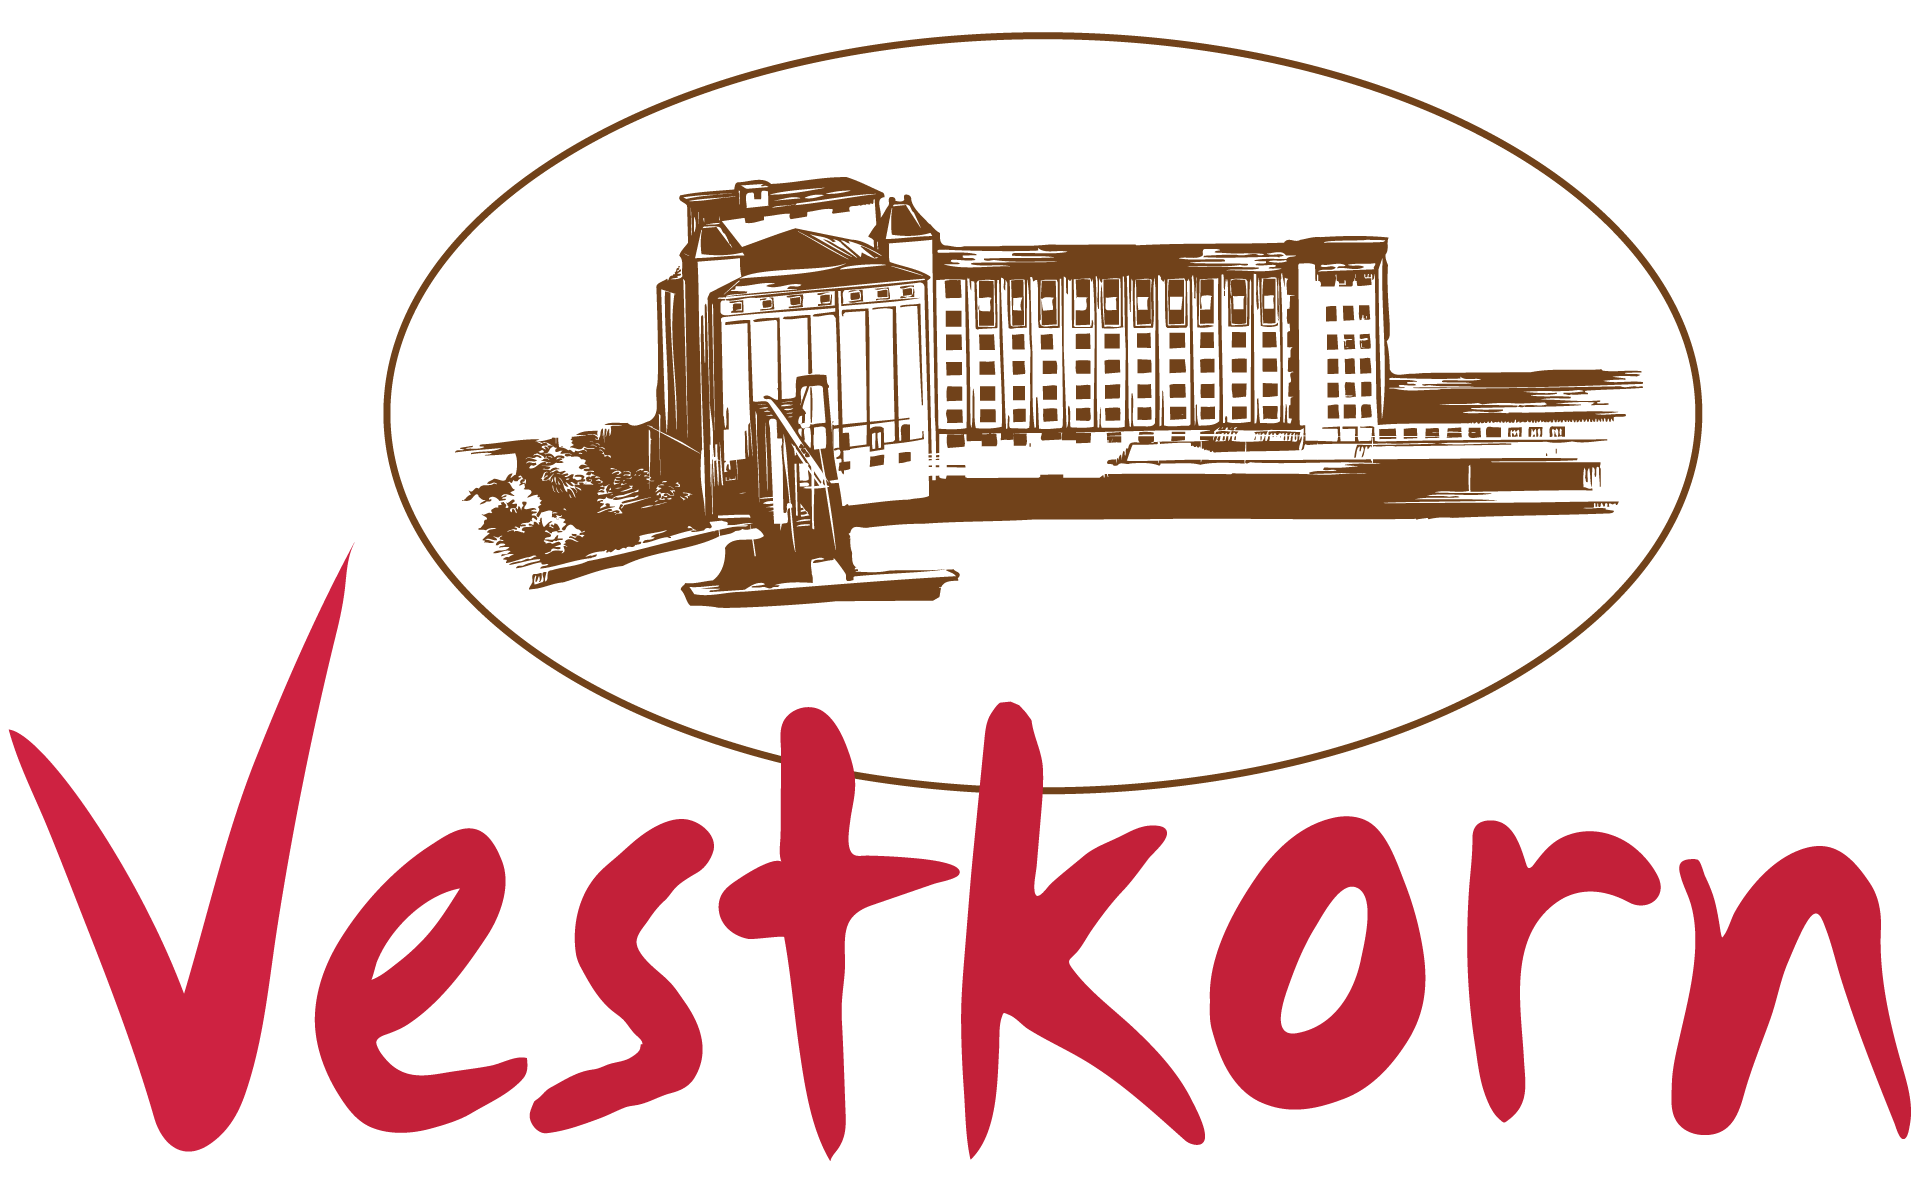 Vestkorn-Logo-Straighten-out-lines-01